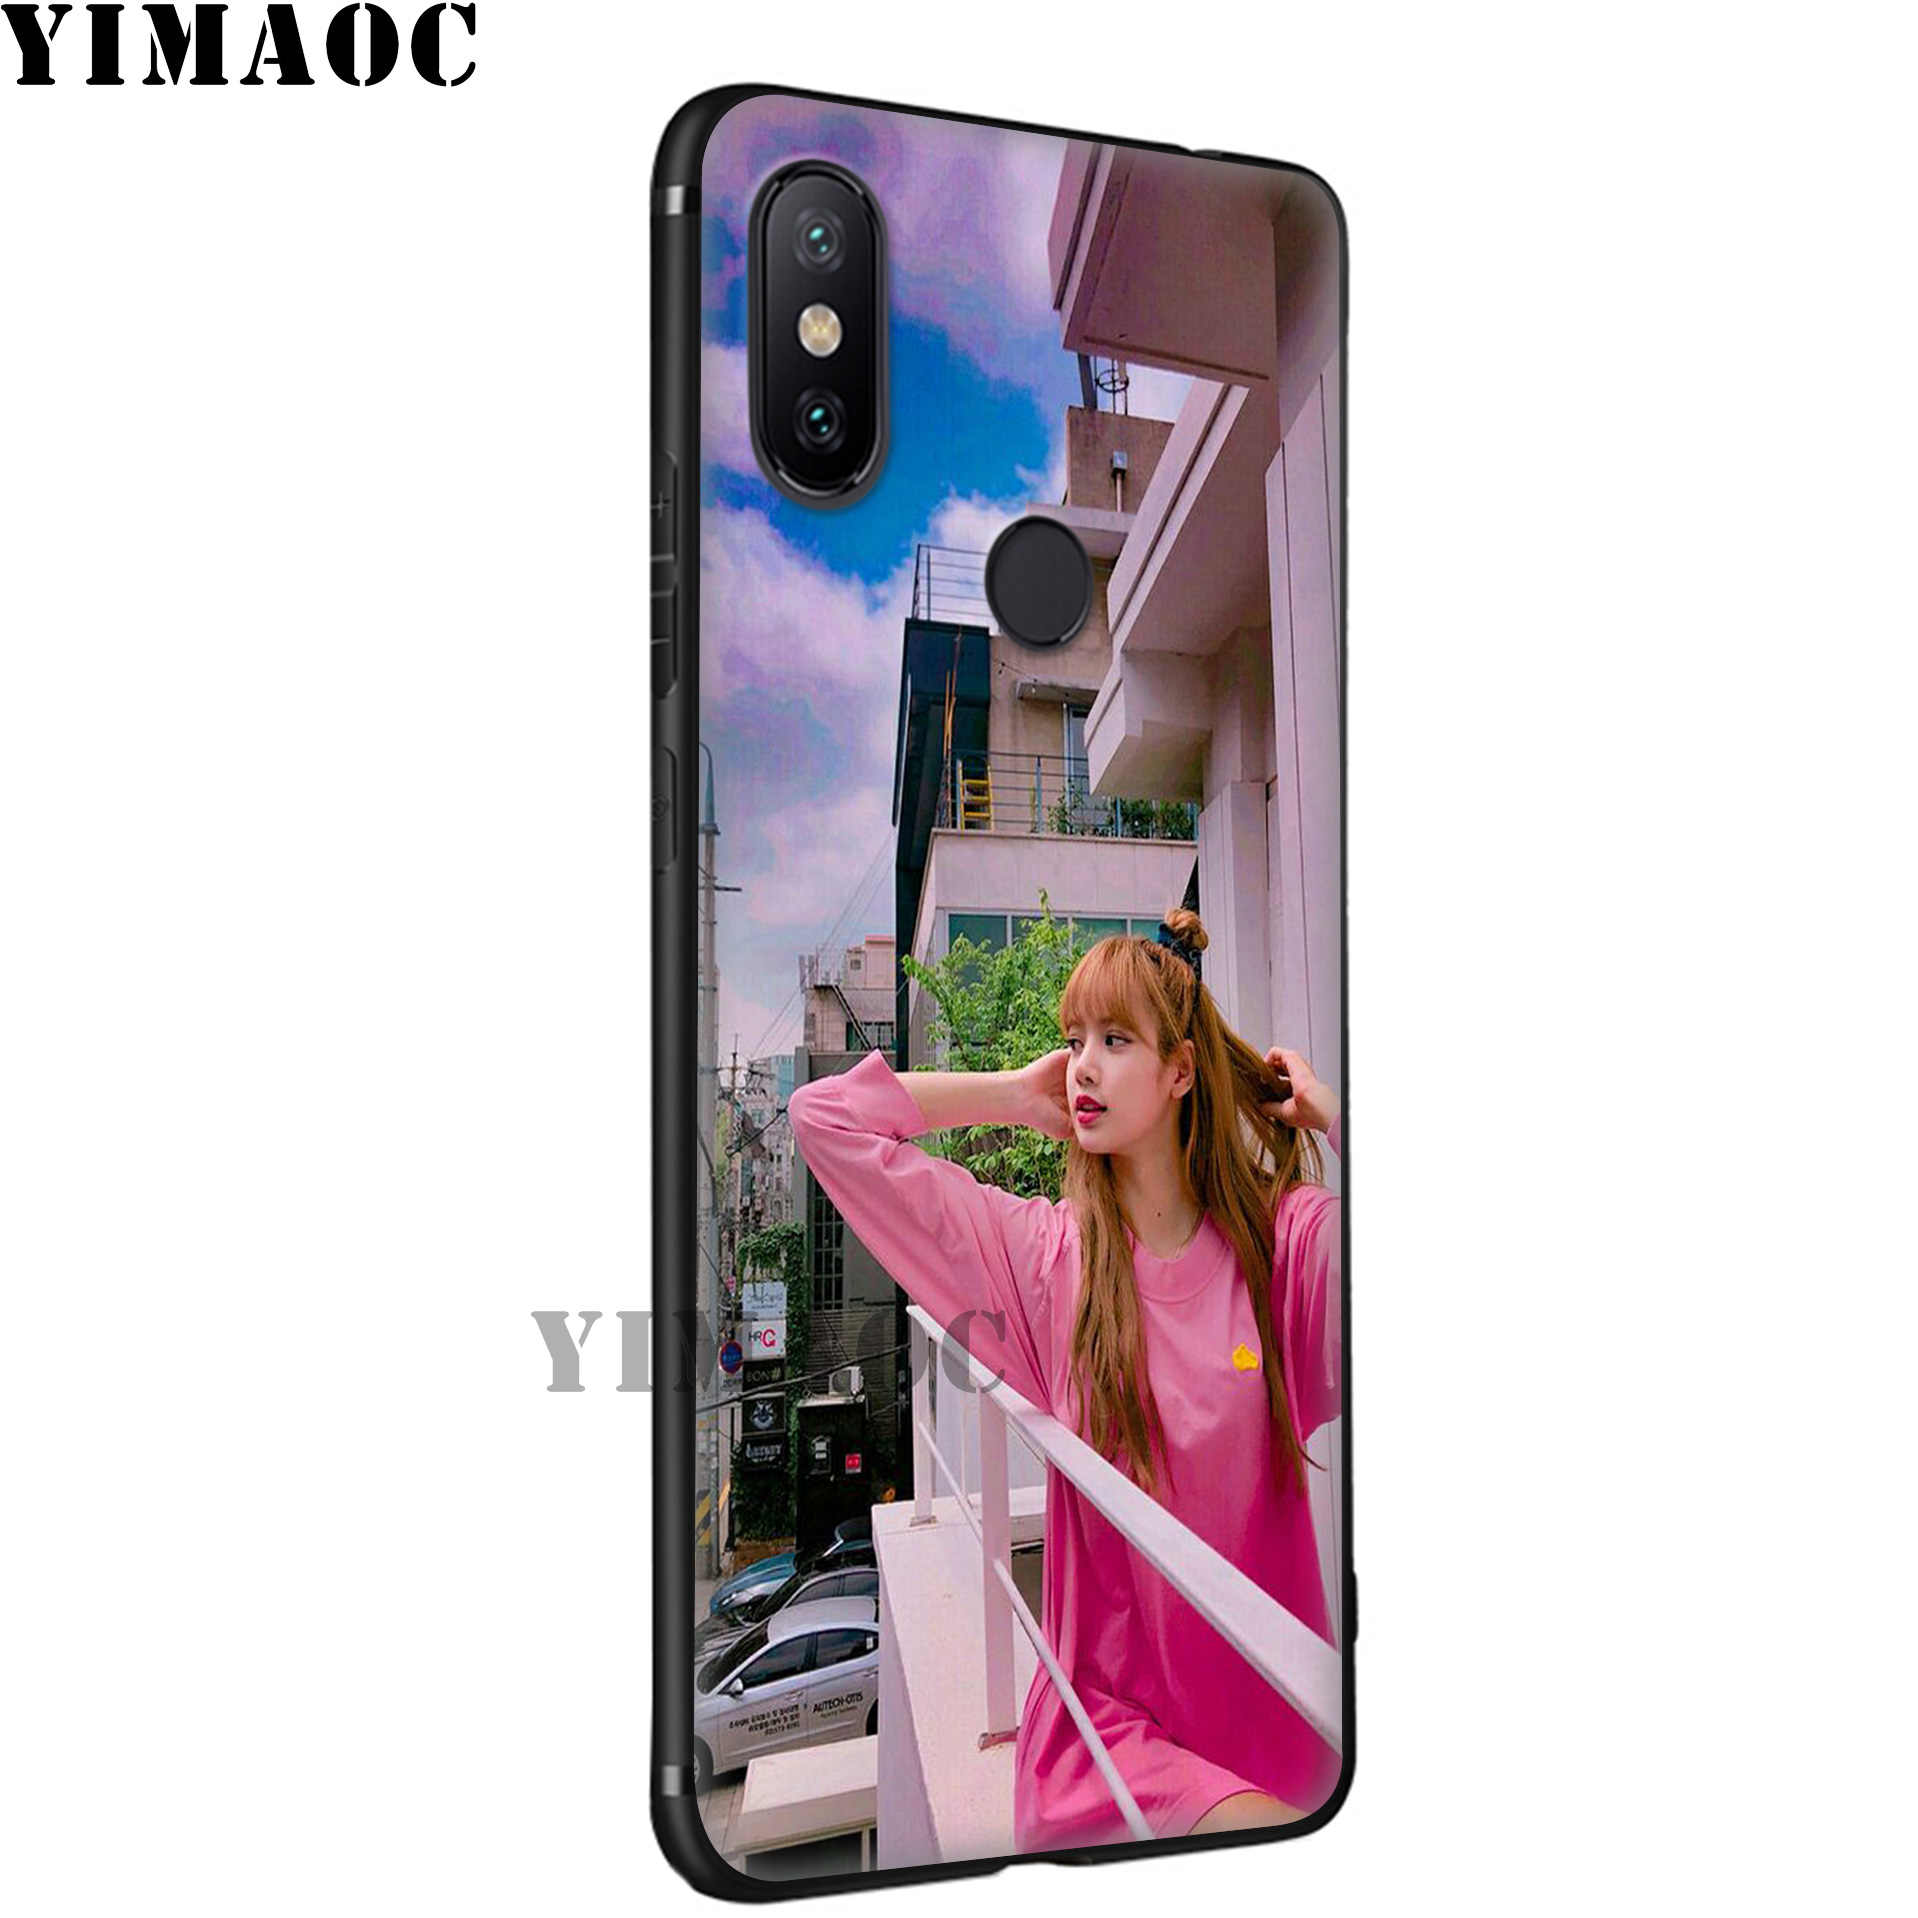 Yimaoc Blackpink Hitam Berwarna Merah Muda Lembut Case untuk Xiao Mi Mi 9T 9 8 Se 6 Max 3 A1 A2 lite Mi A1 Mi A2 CC9E CC9 6X 5X Pocophone F1